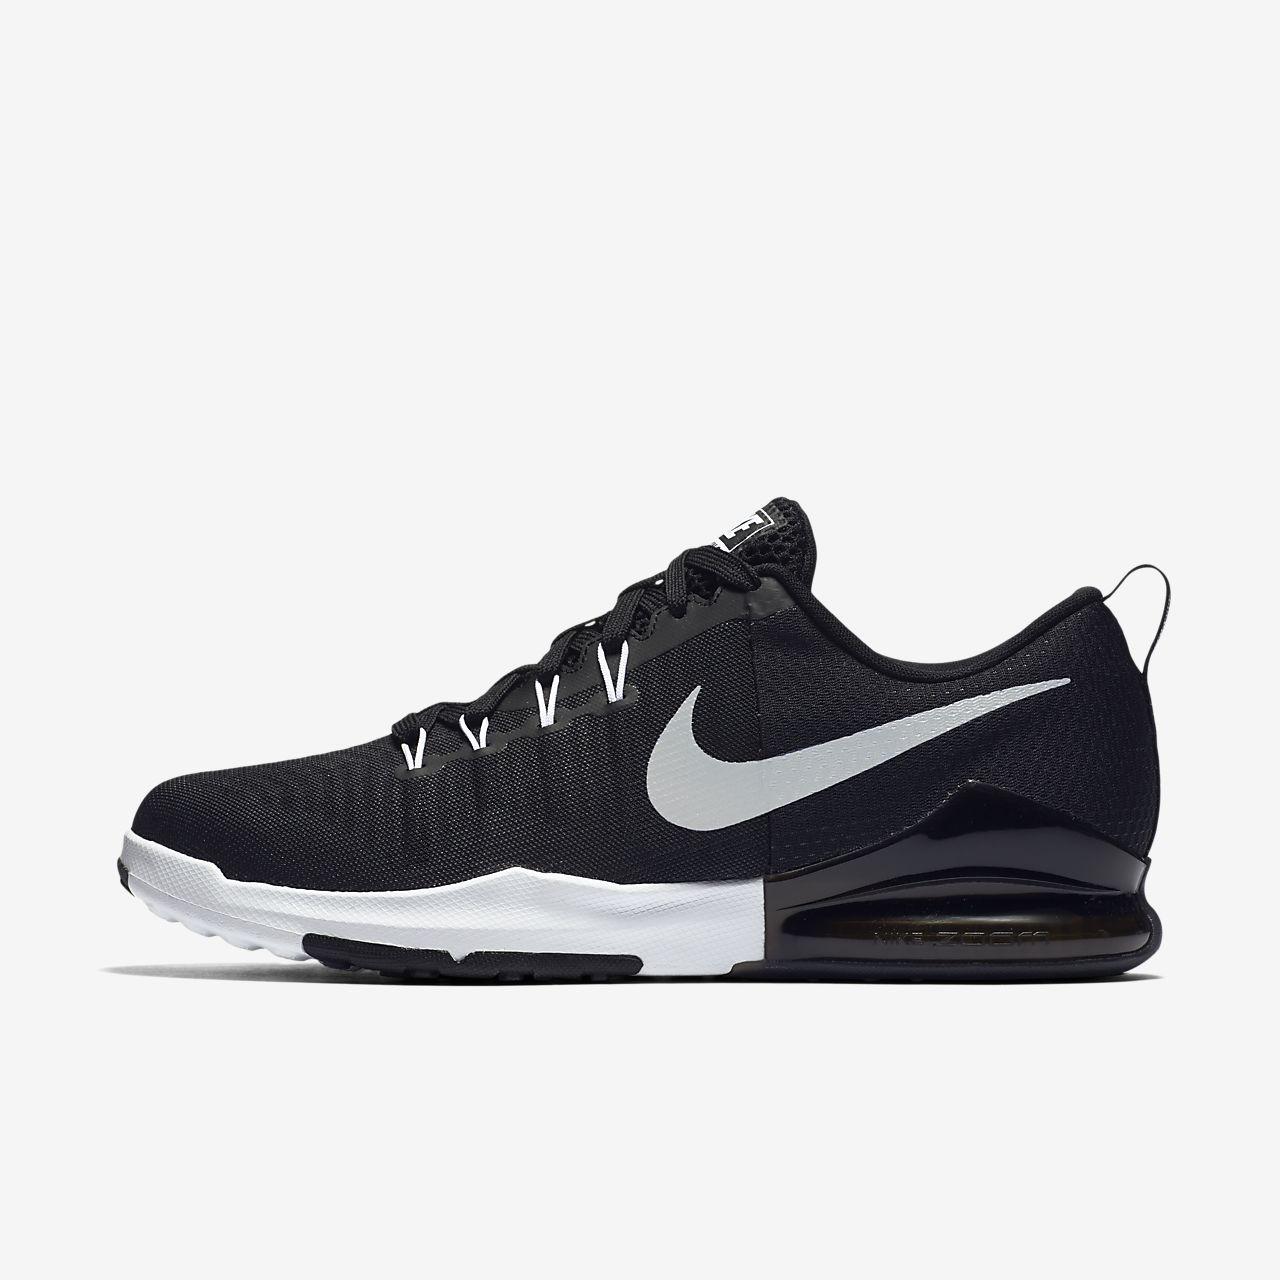 Nike Zoom Train Action Men's Training Shoe Black/Anthracite/White/Metallic Silver